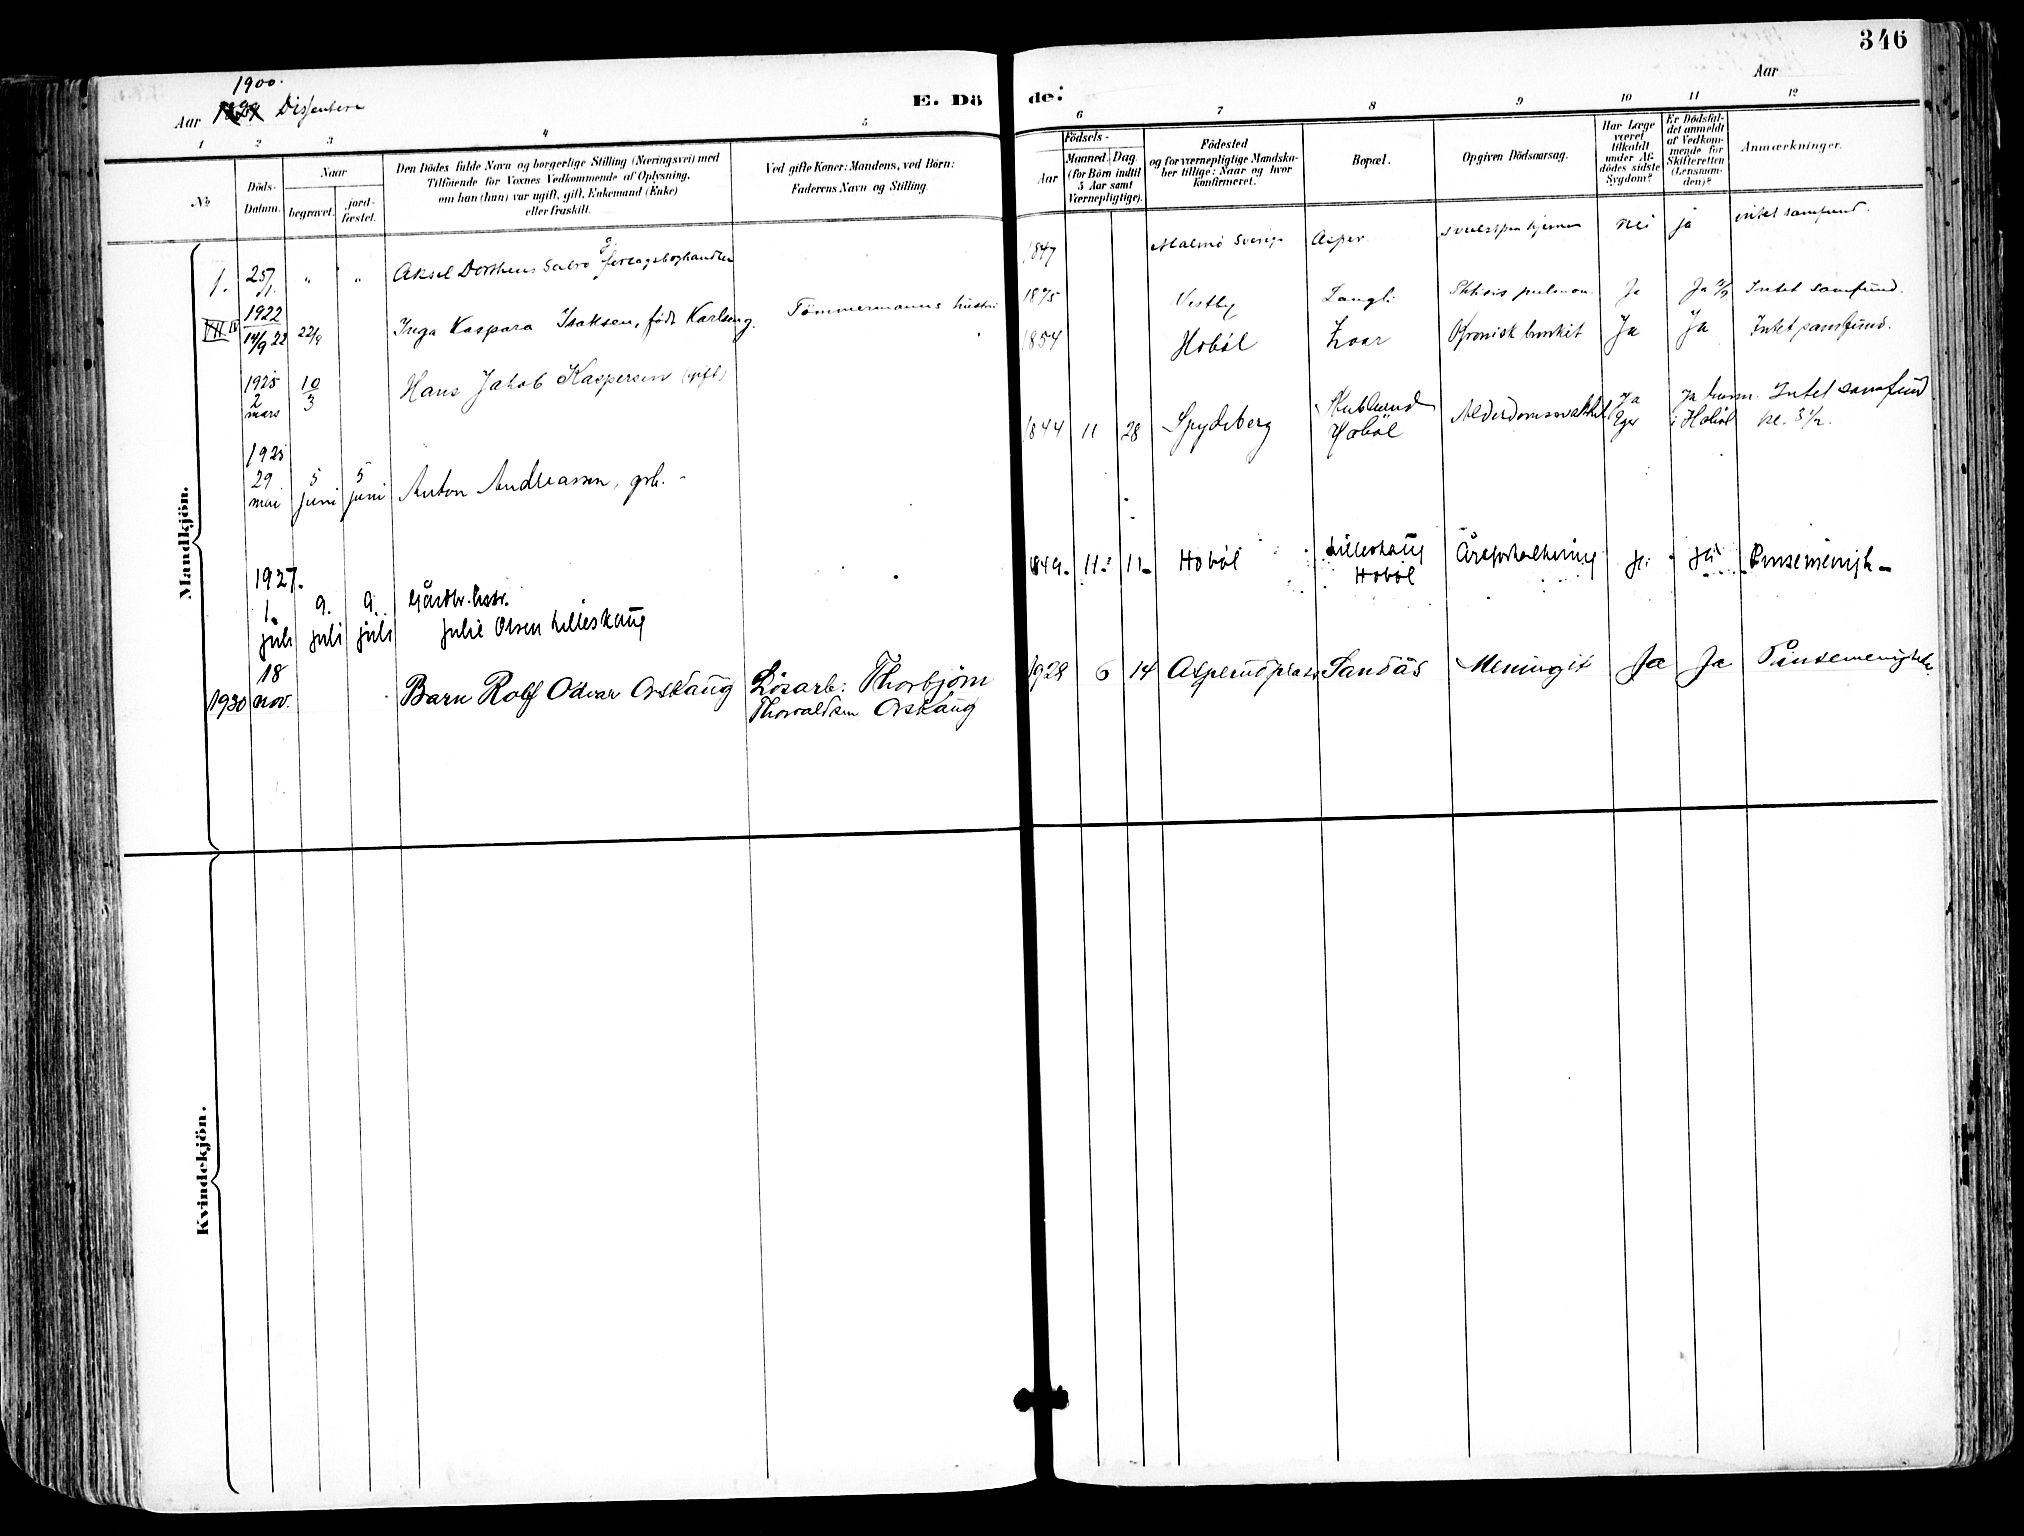 SAO, Kråkstad prestekontor Kirkebøker, F/Fa/L0010: Ministerialbok nr. I 10, 1893-1931, s. 346